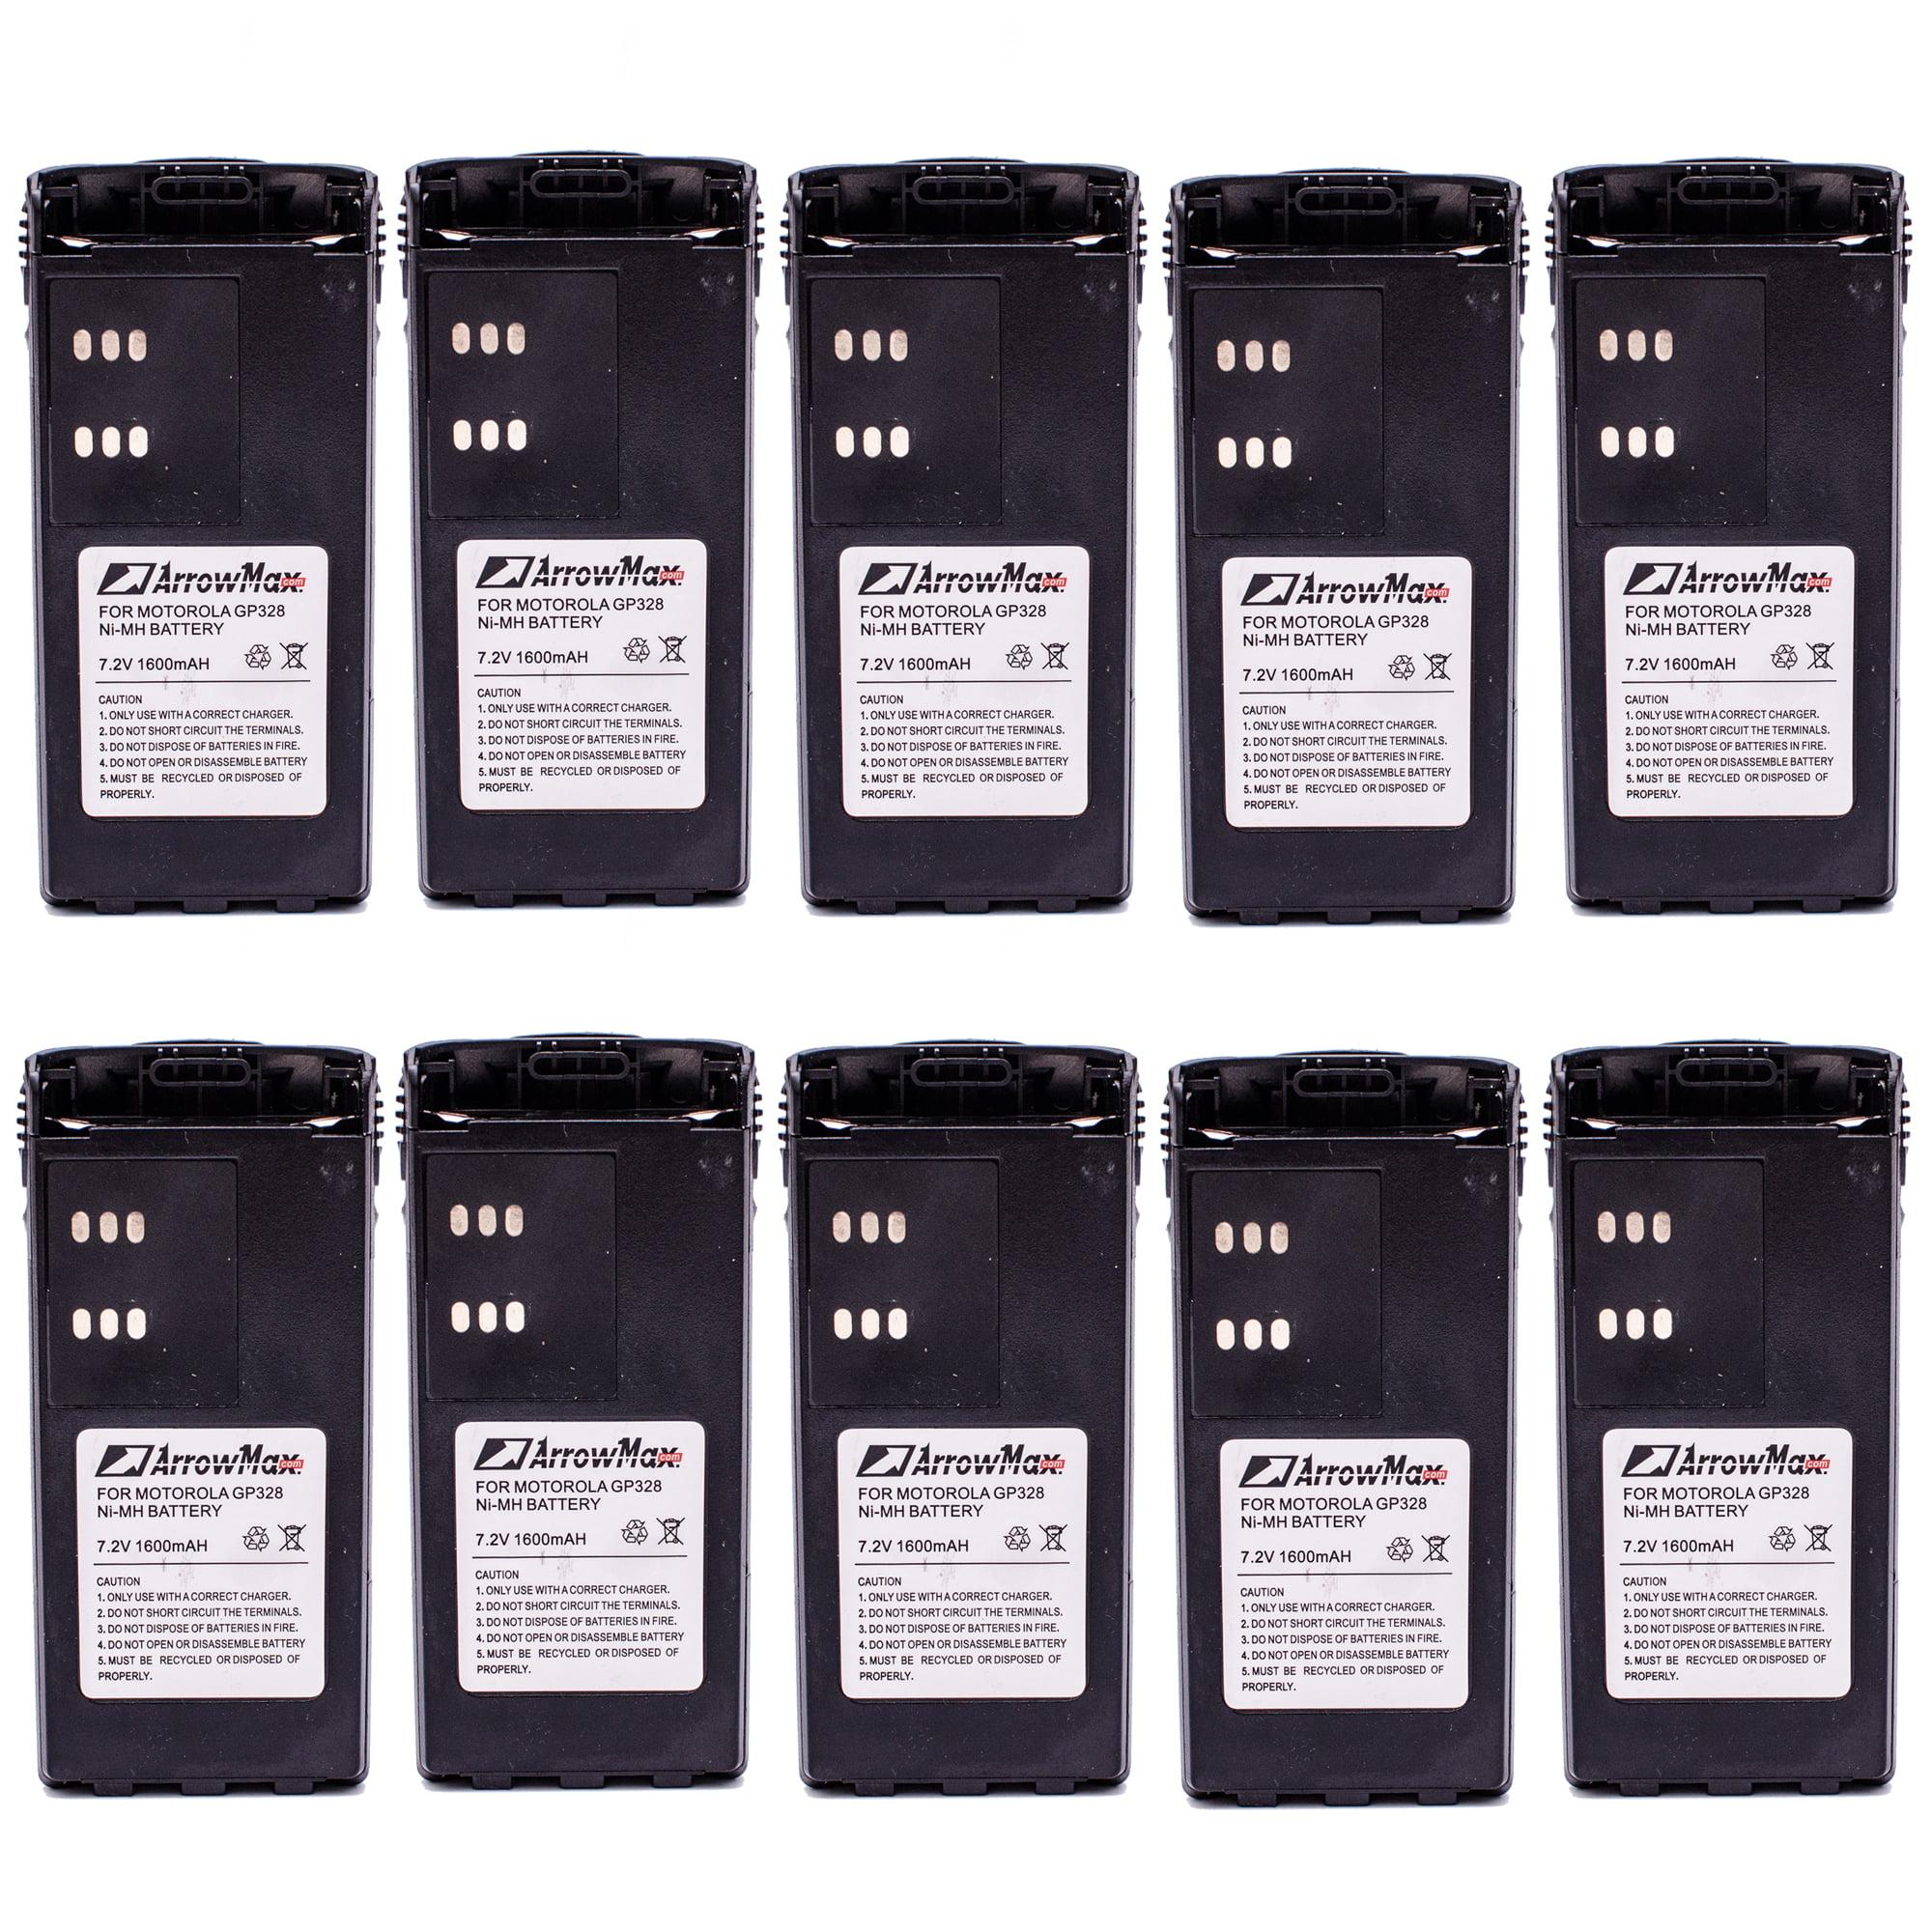 4 pcs HNN9008 HNN9009 Battery for Motorola GP140 GP328 GP338 HT750 HT1250 HT1550